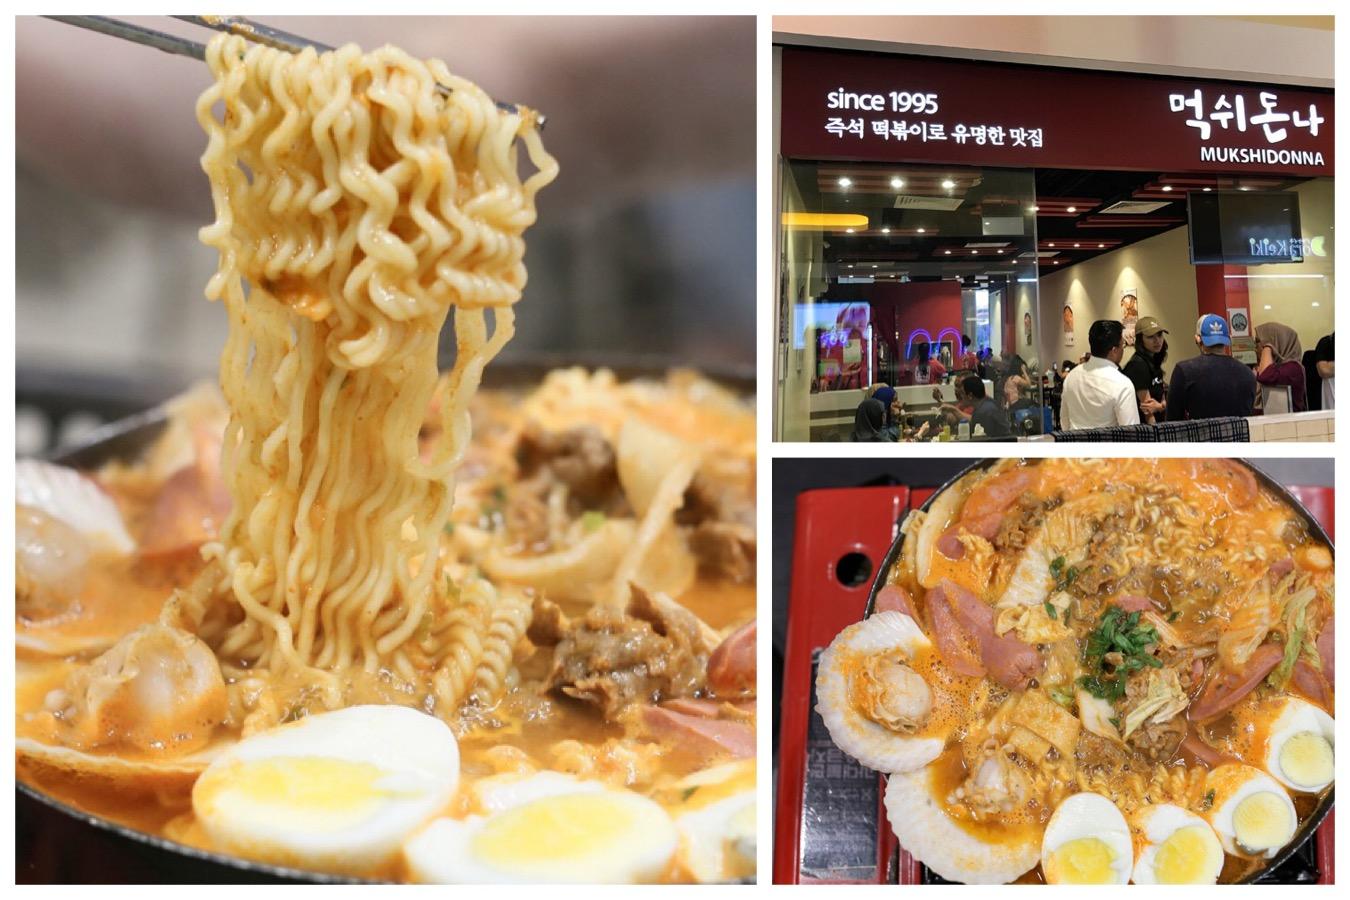 Mukshidonna Singapore - Halal Korean Restaurant For Army Stew & Toppoki, At Pasir Ris Downtown East